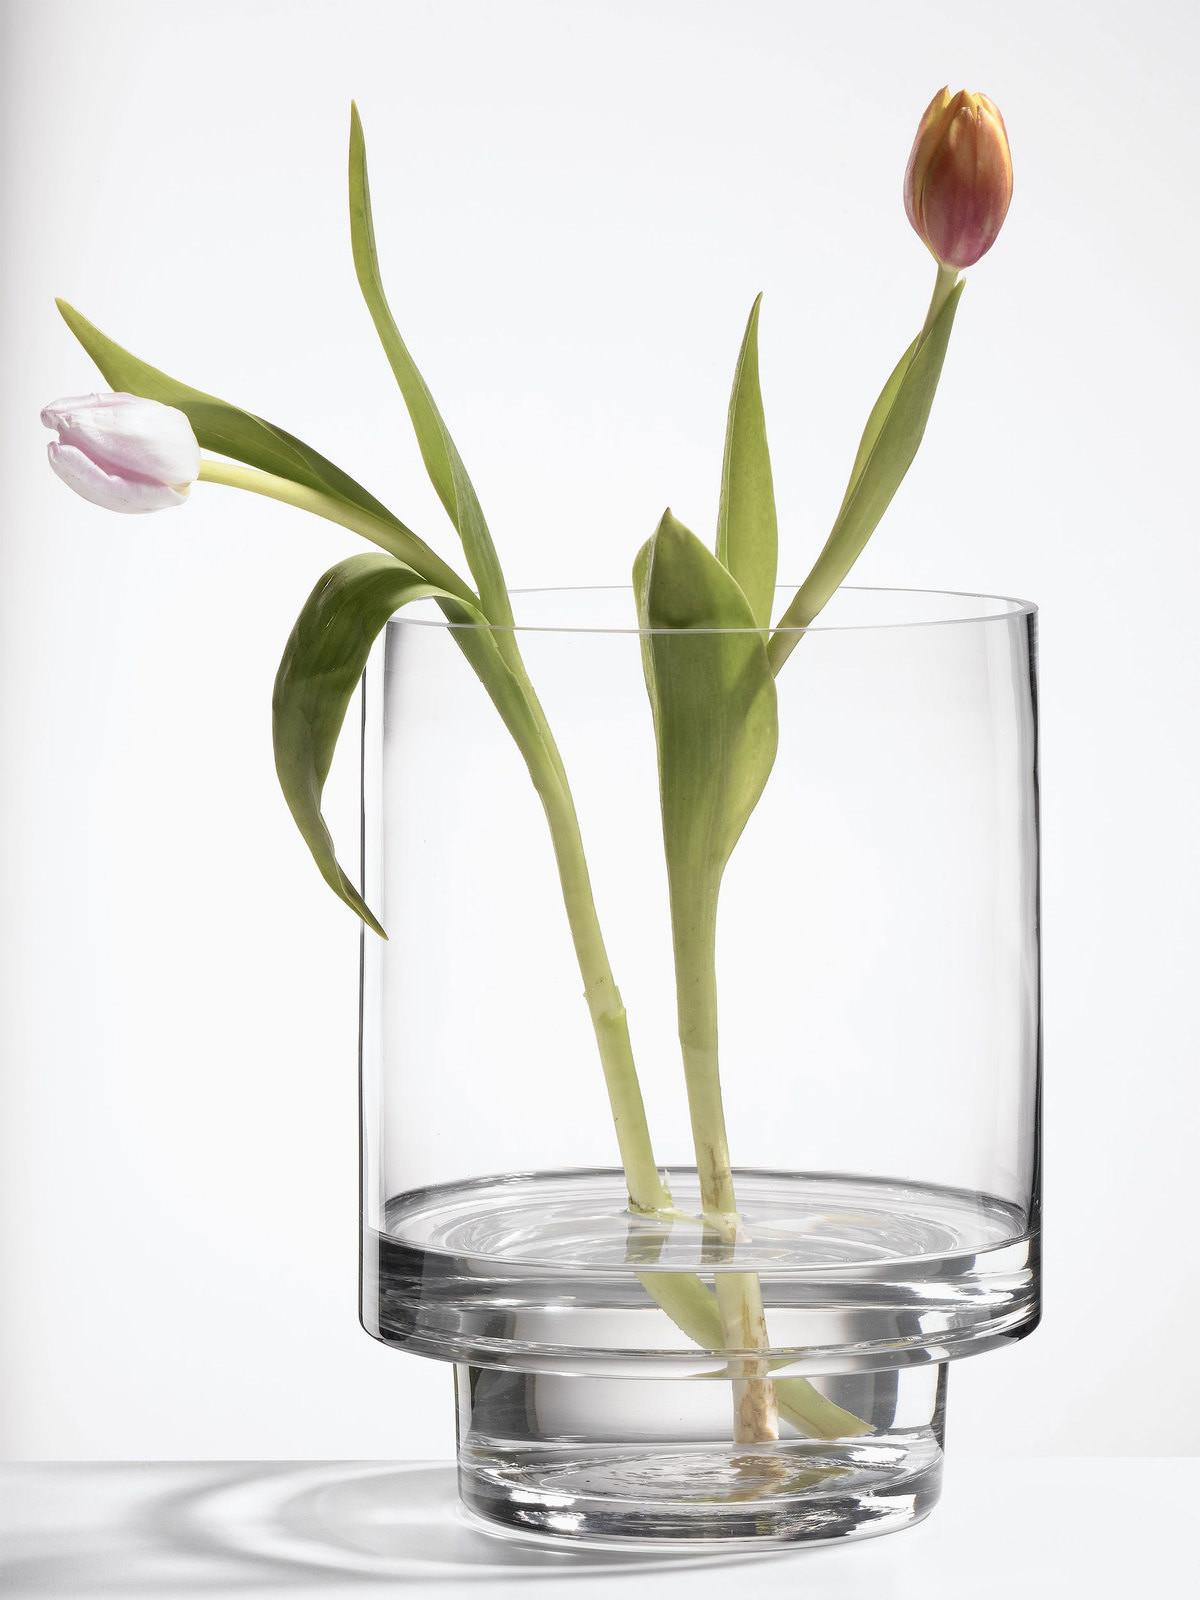 Vase for Long Stem Flowers Of Casa Nova Casa Nova Vase Online Entdecken Schaffrath Ihr Ma¶belhaus Regarding Casa Nova Casa Nova Vase